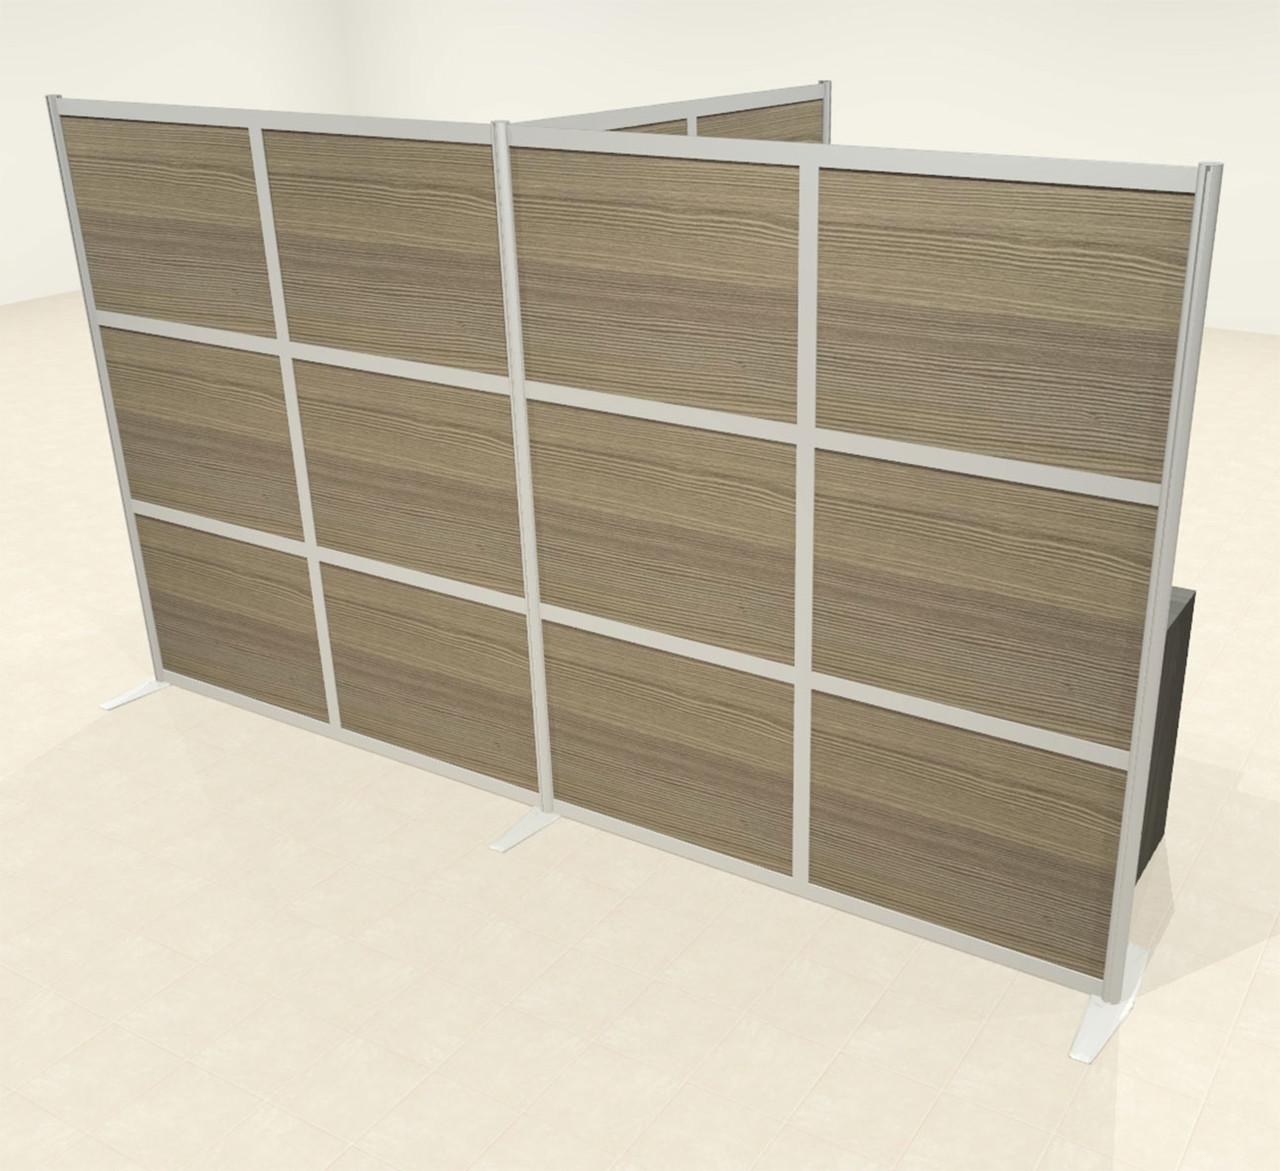 One T Shaped Loft Modern Office Home Aluminum Frame Partition / Divider / Sneeze Guard, #UT-ALU-P71